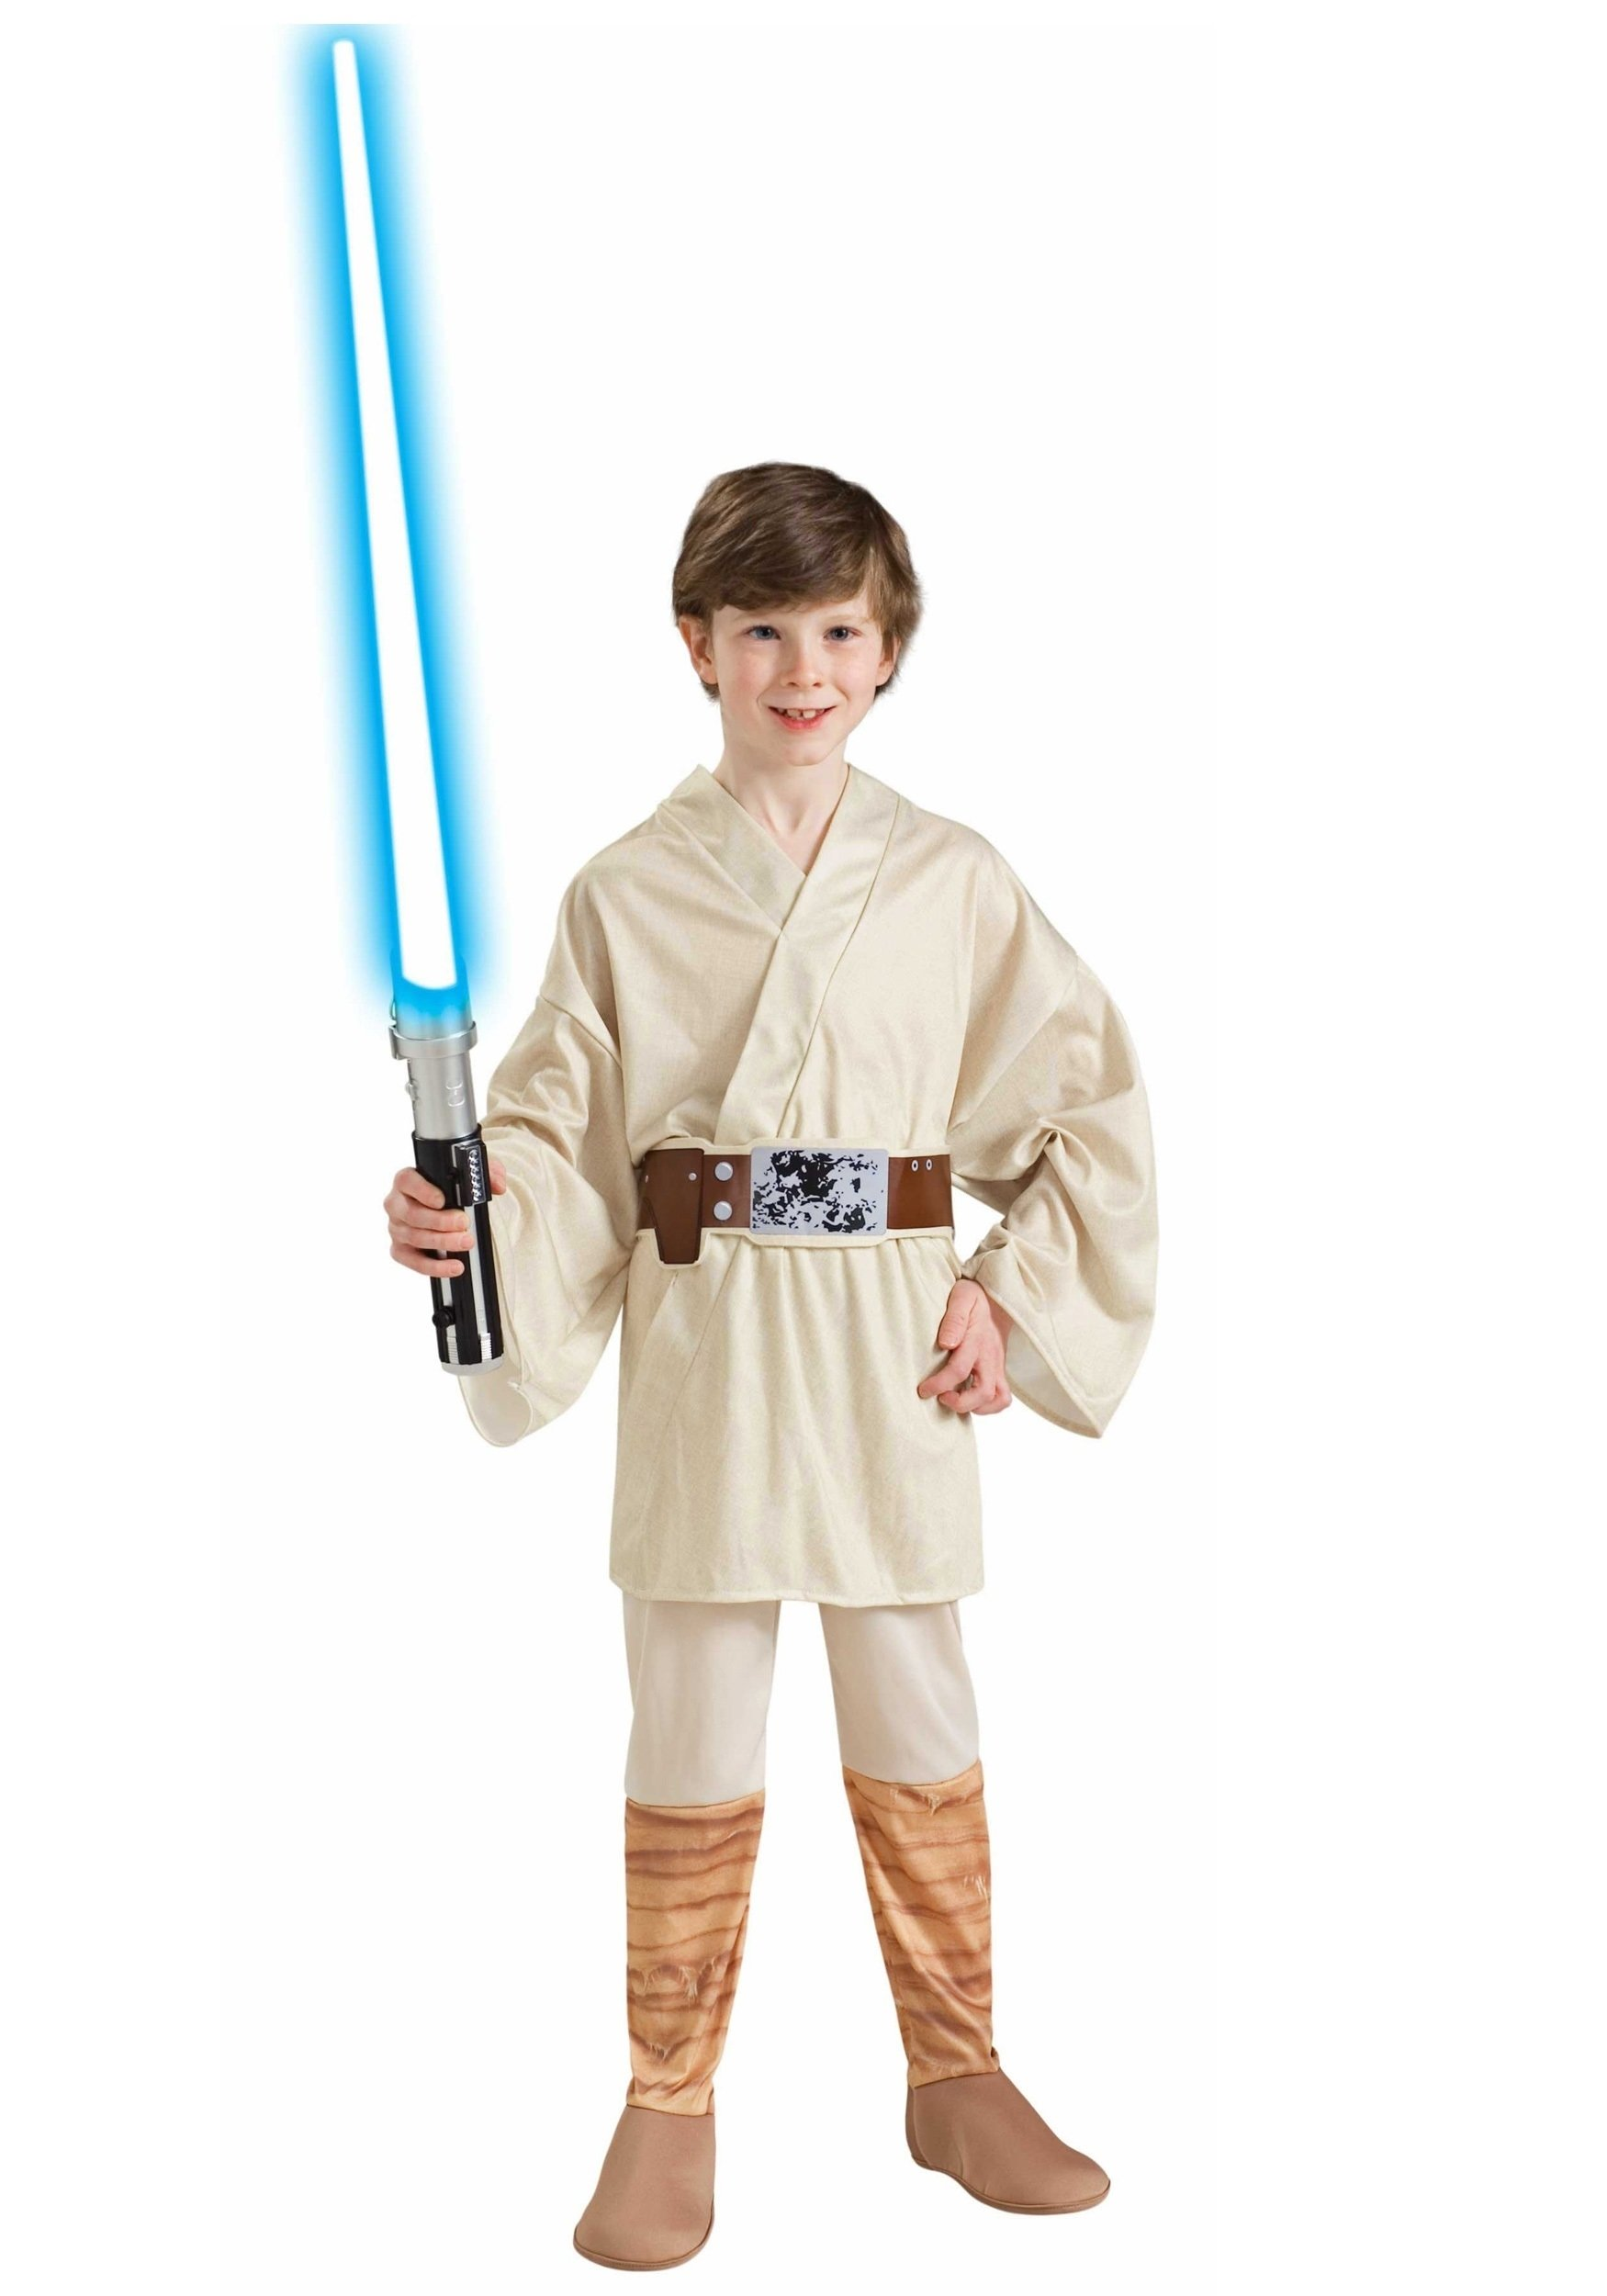 10 Ideal Halloween Costumes For Kids Ideas kids luke skywalker costume 2021